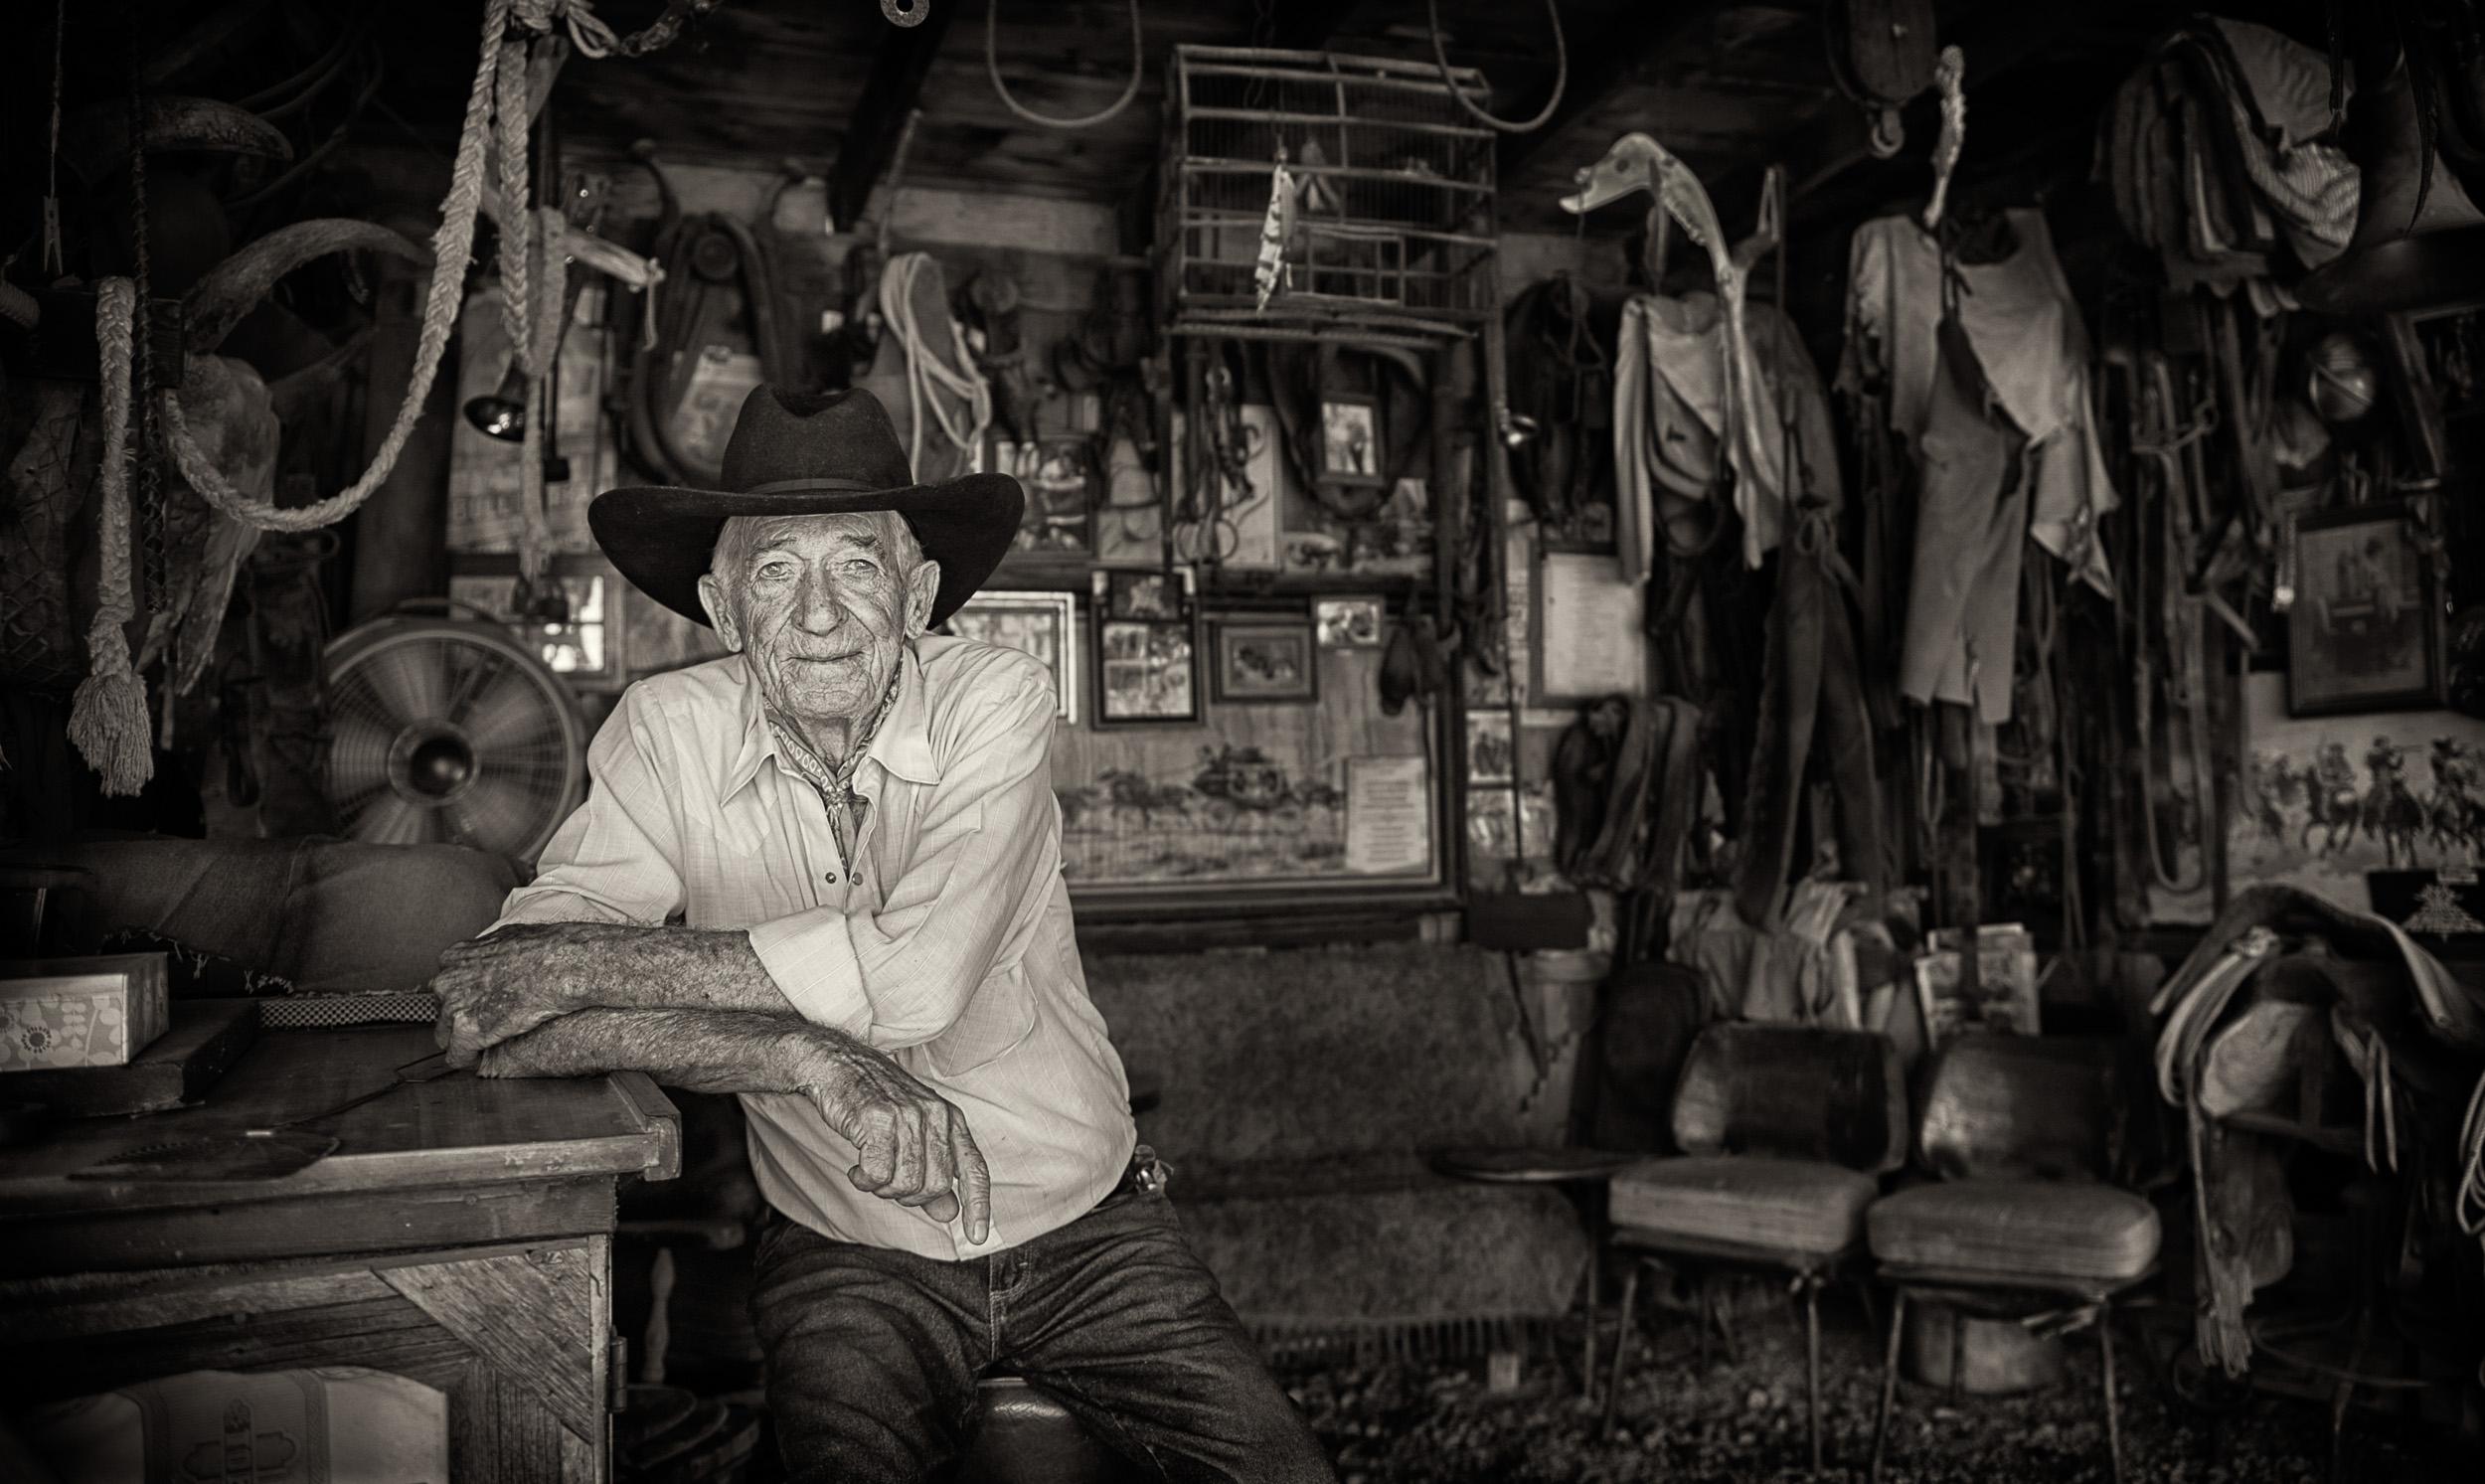 Portraits taken of Fargo at Museum Ranch in Wilcox, Arizona by Paul Davis Photography